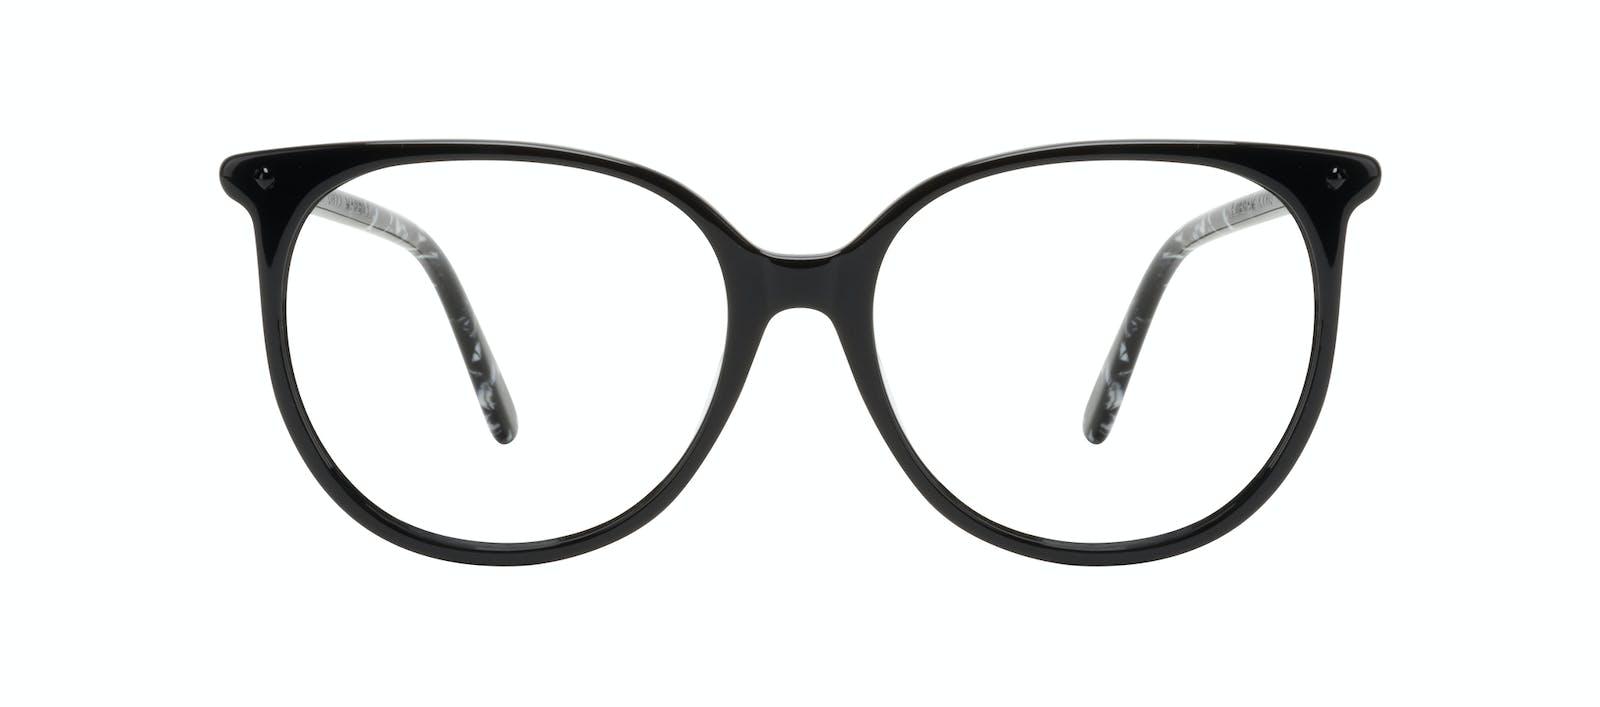 30e87de0e51 Affordable Fashion Glasses Round Eyeglasses Women Area Onyx Marble Front